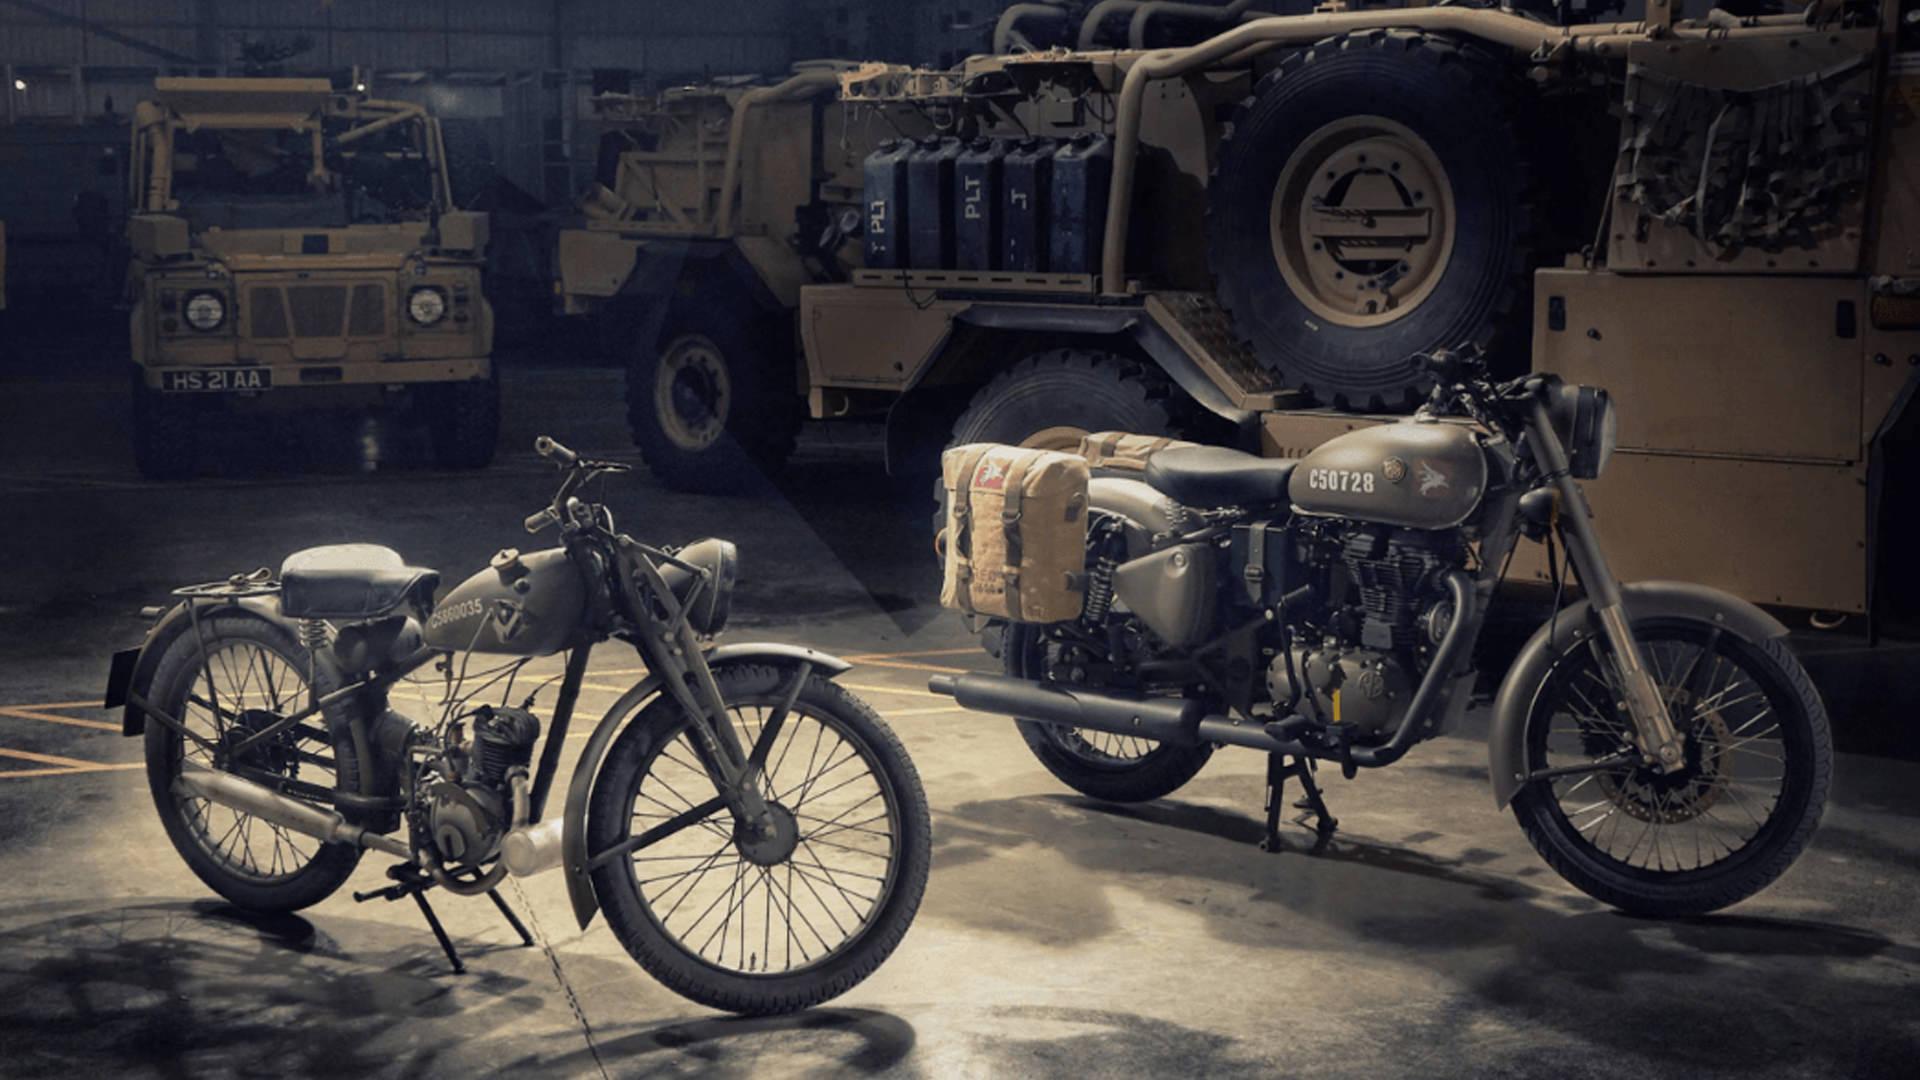 Royal Enfield Classic 500 Pegasus Motorbike Auction at Milsoms Kesgrave Hall